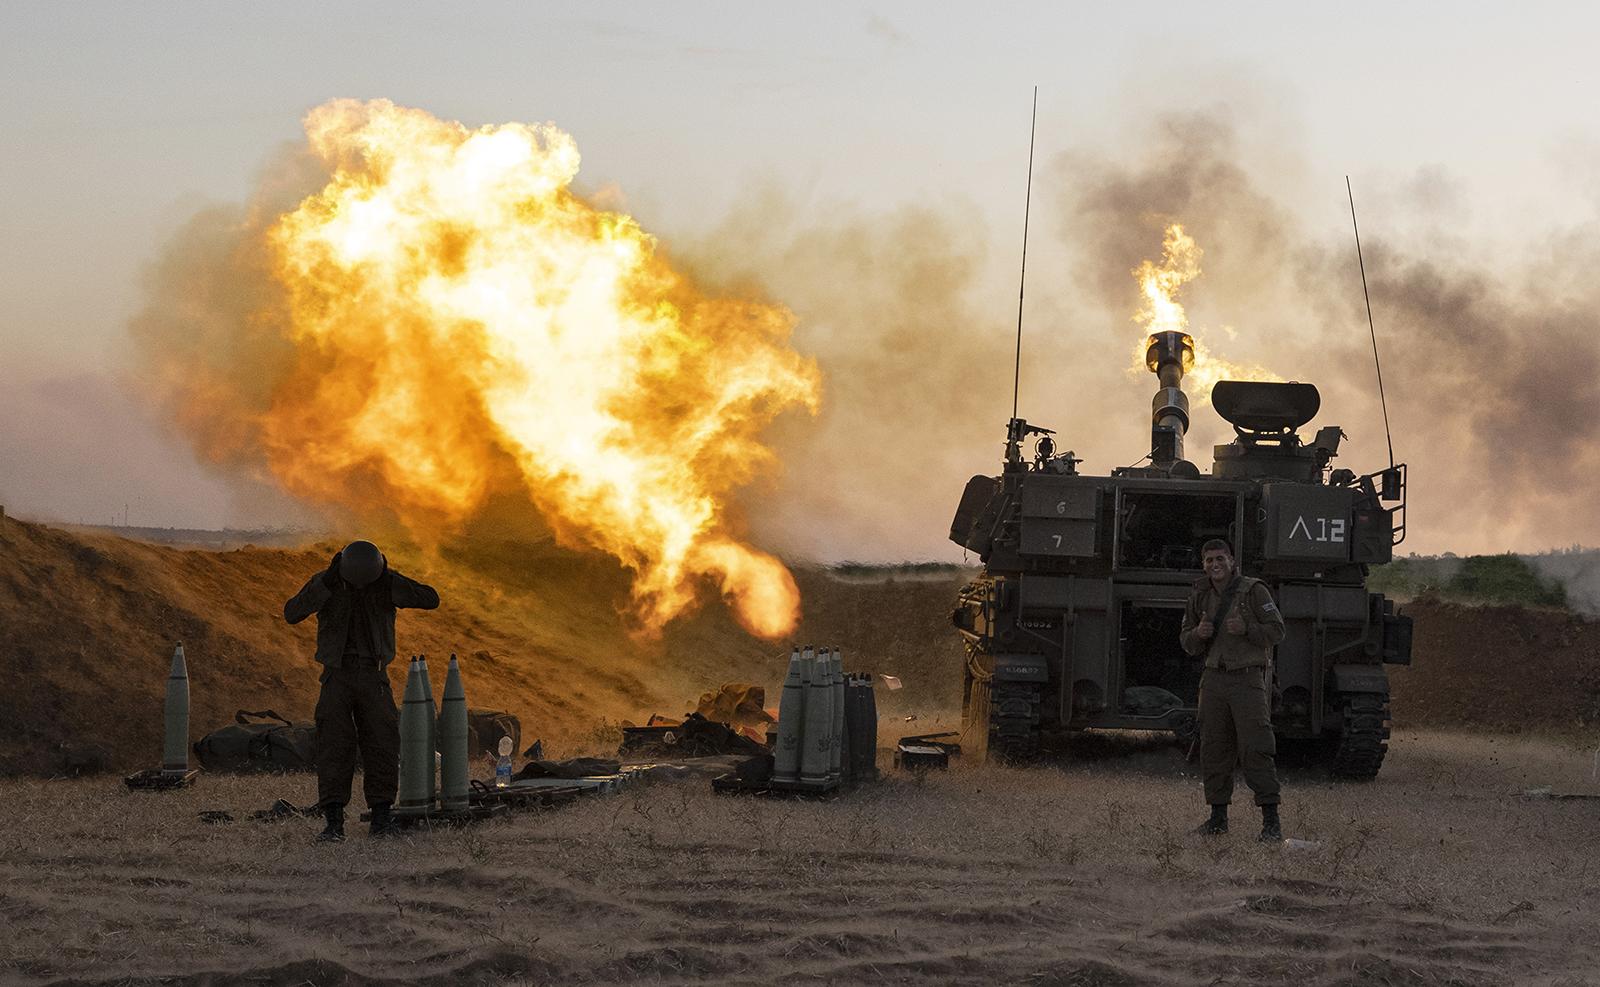 An Israeli artillery unit fires shells towards targets in Gaza Strip, at the Israeli Gaza border, Wednesday, May 19, 2021. AP